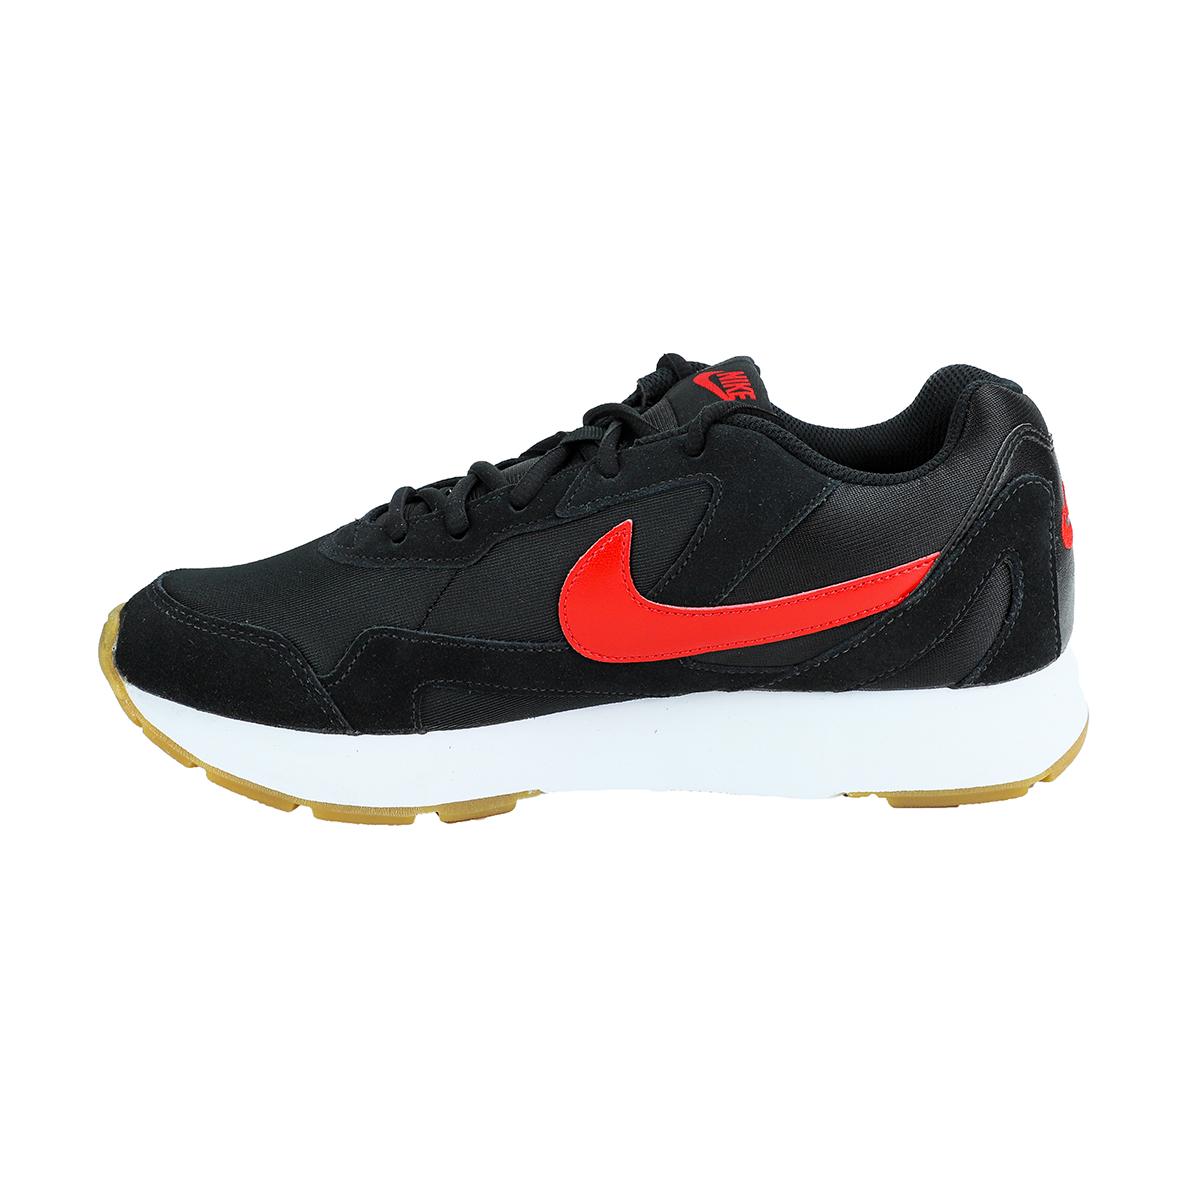 Nike-Men-039-s-Delfine-Running-Shoes thumbnail 6